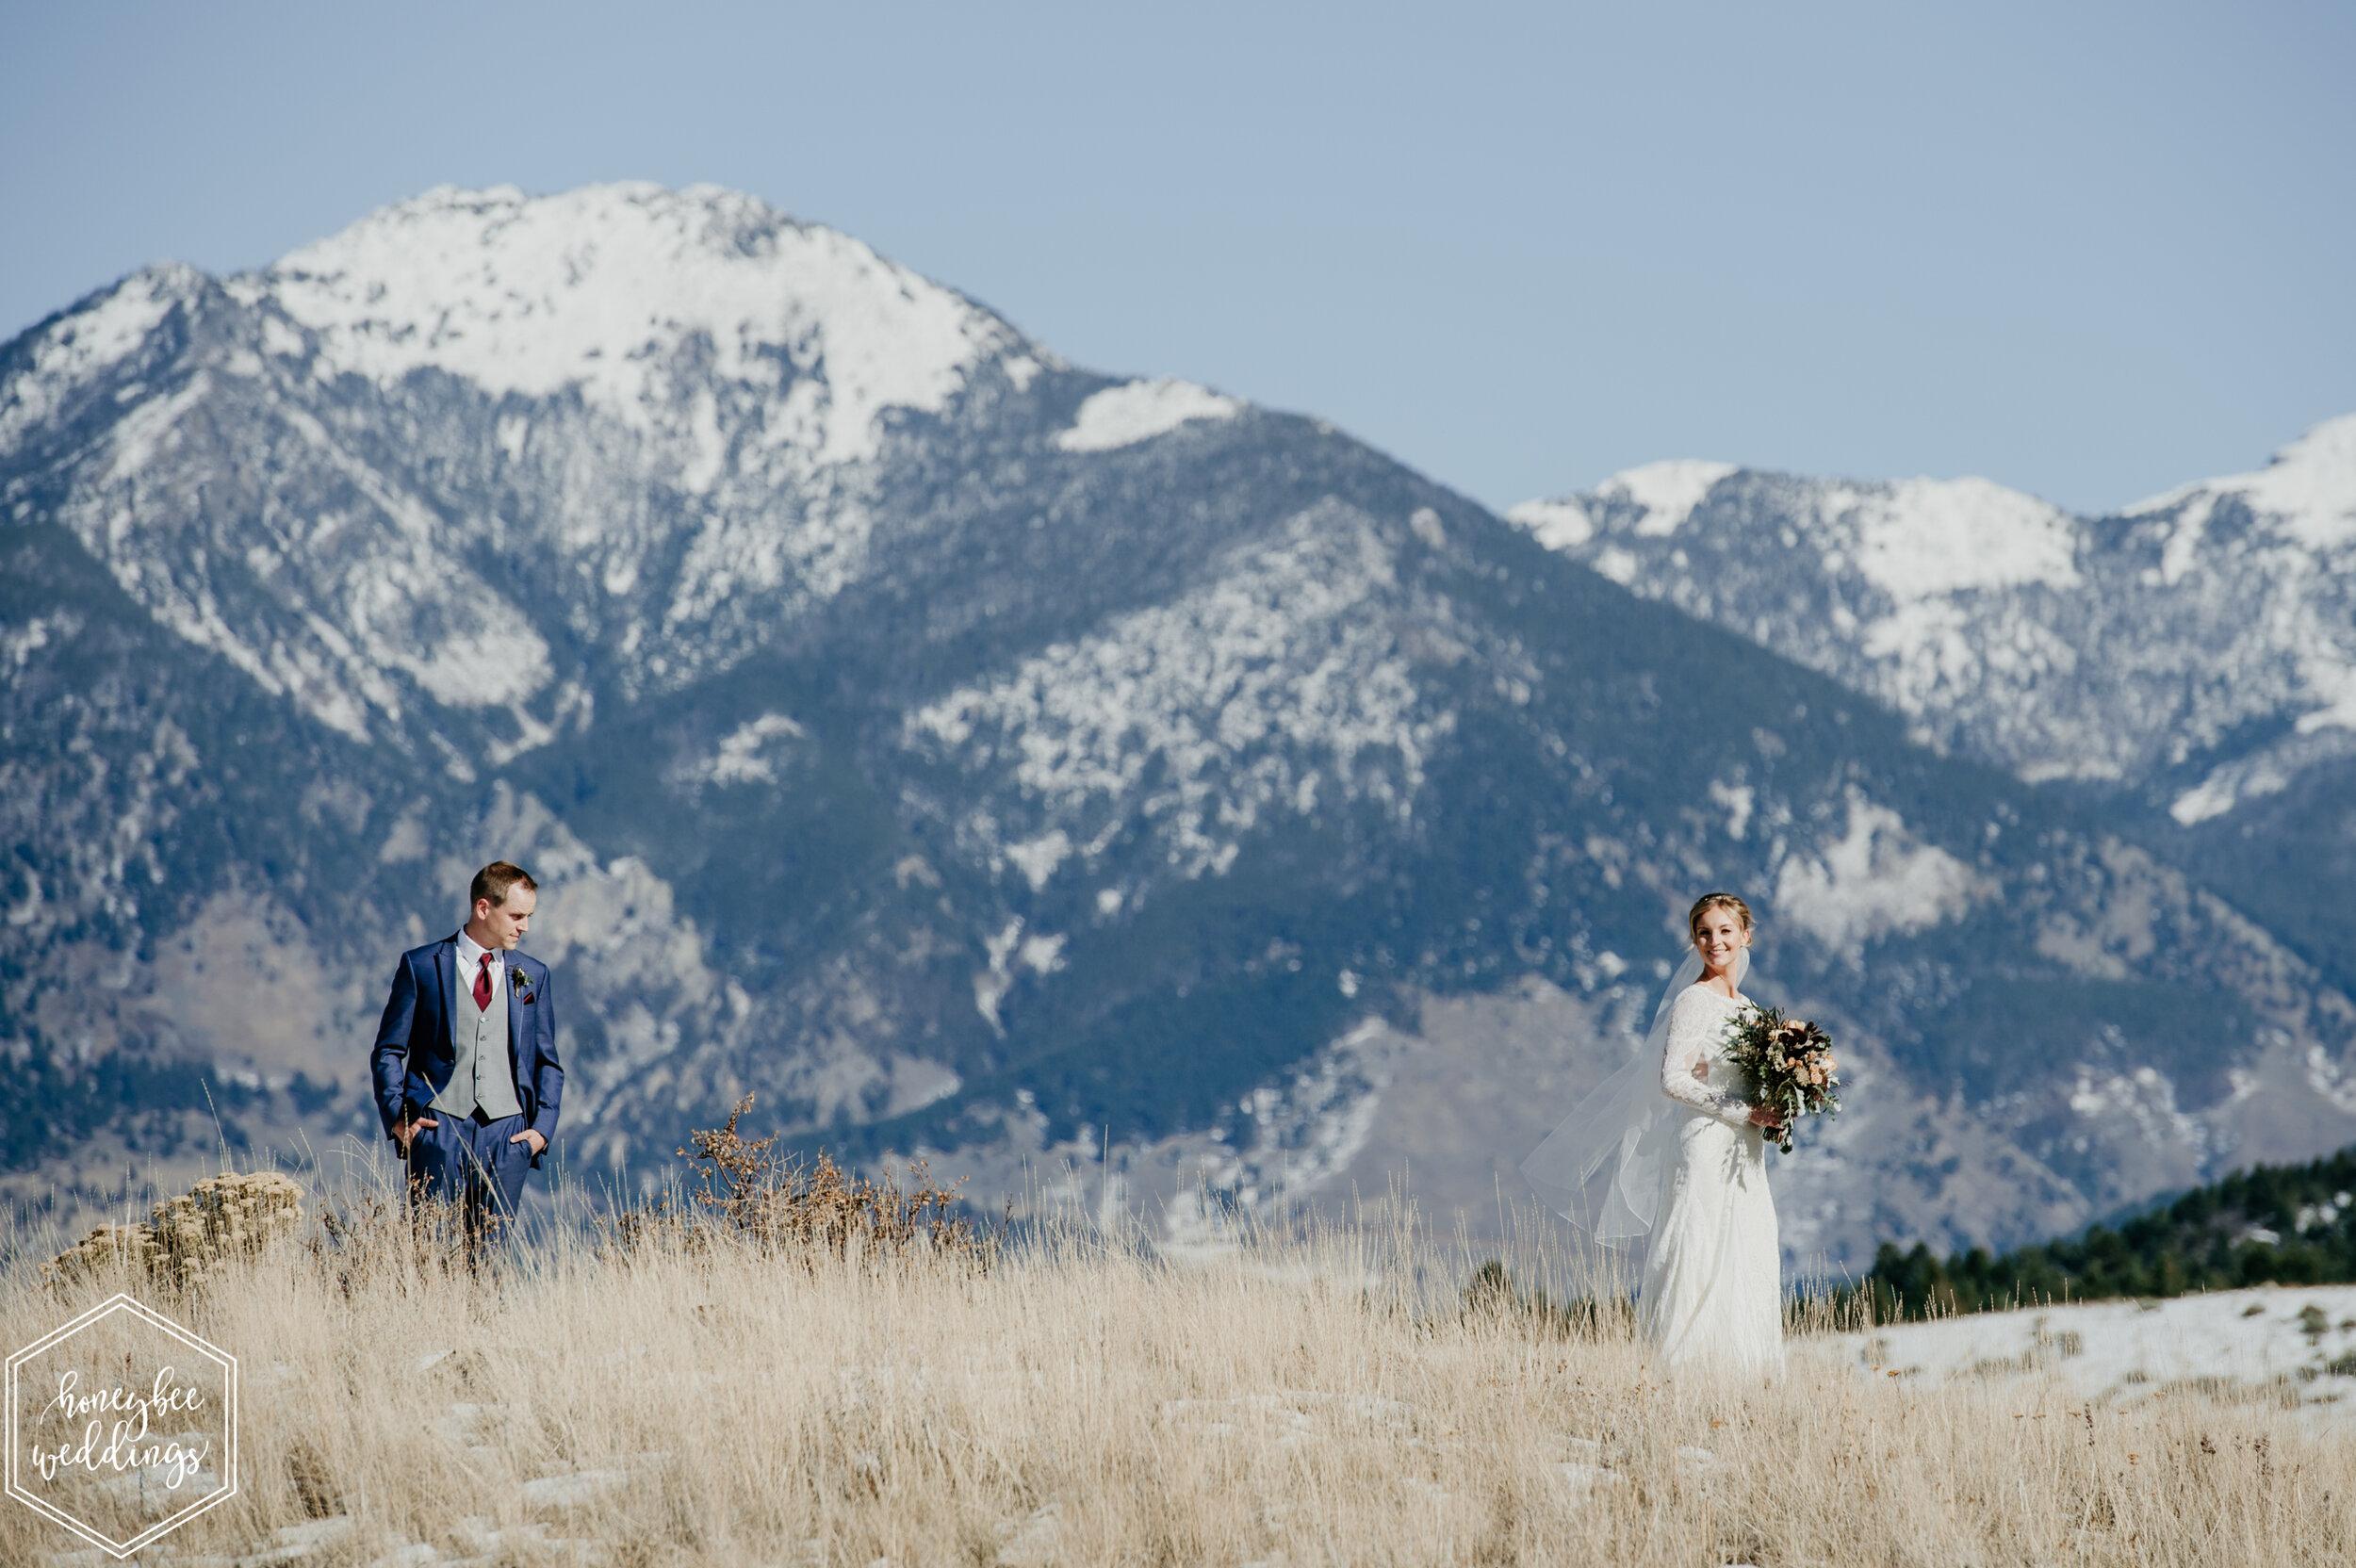 073Chico Hot Springs Wedding_Montana Wedding Photographer_Winter Wedding_Ariel & Richard_October 12, 2019-2101.jpg